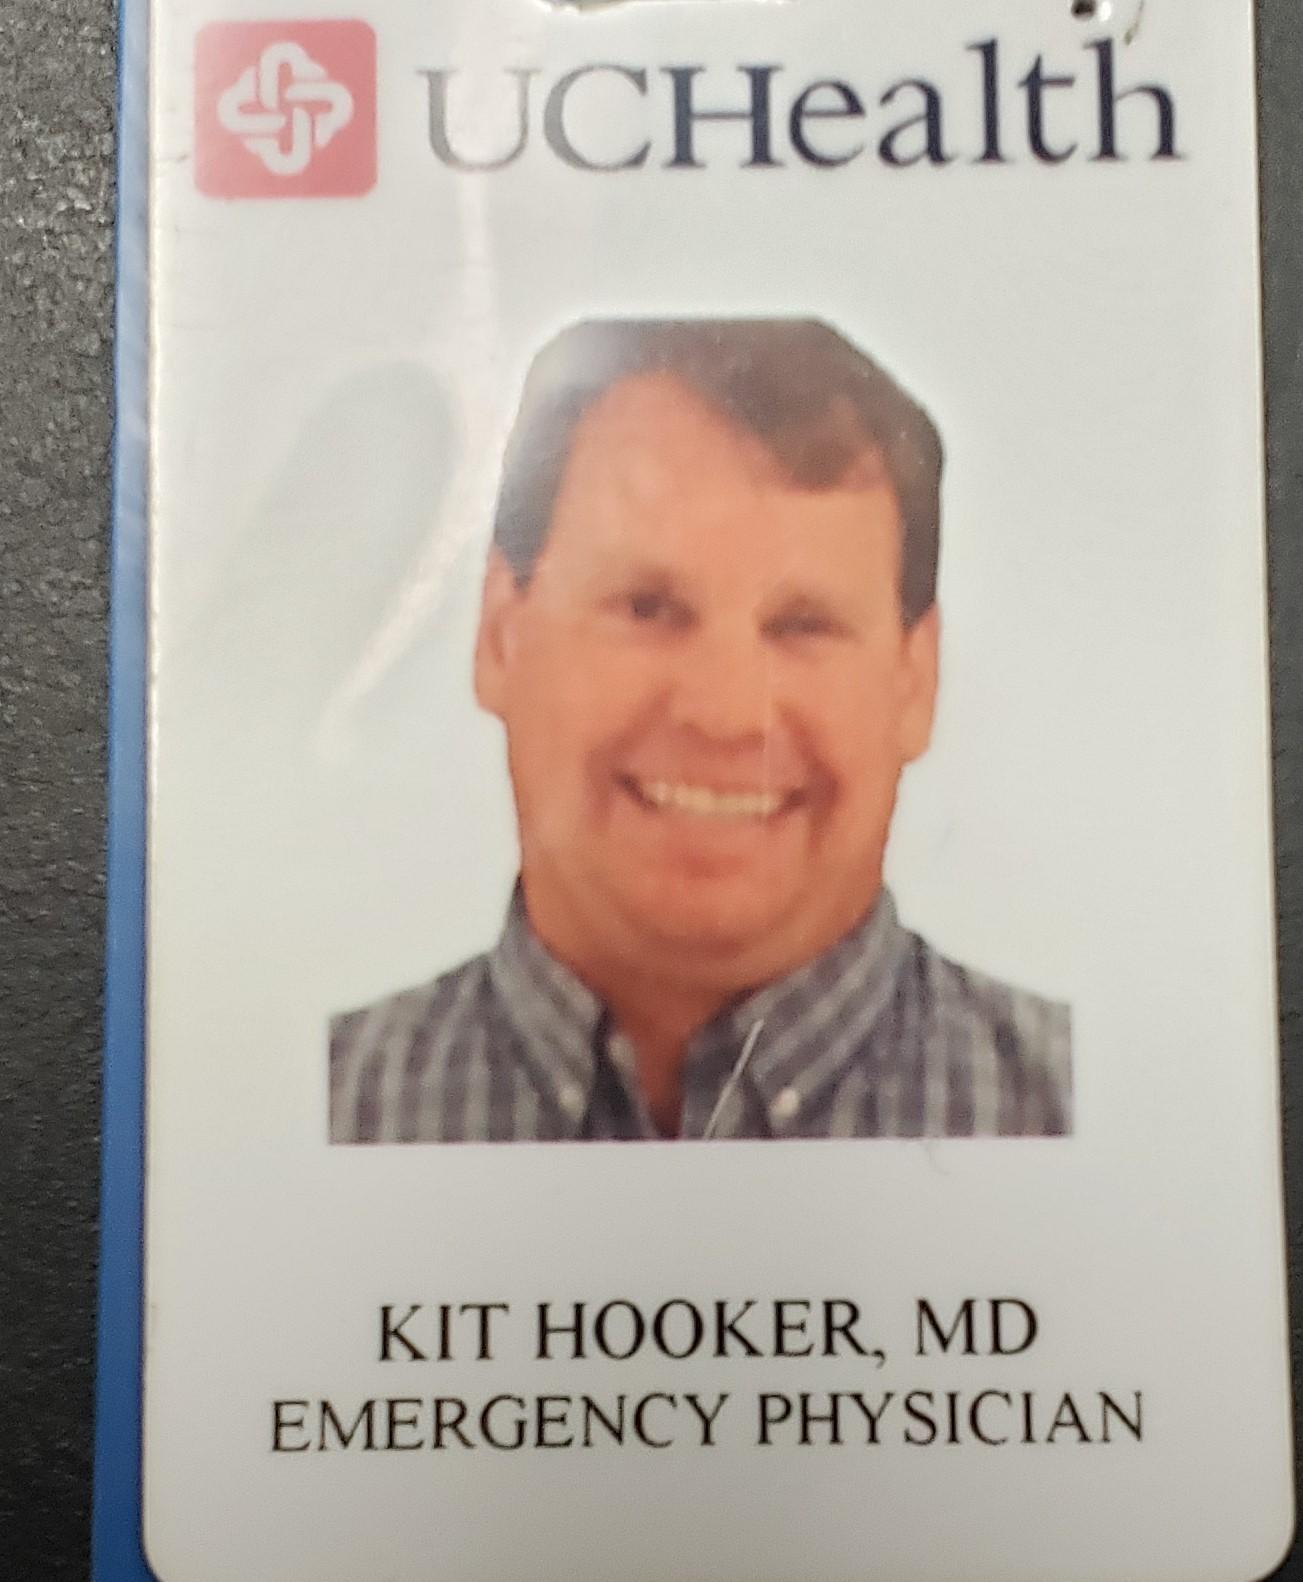 Kit Hooker, MD